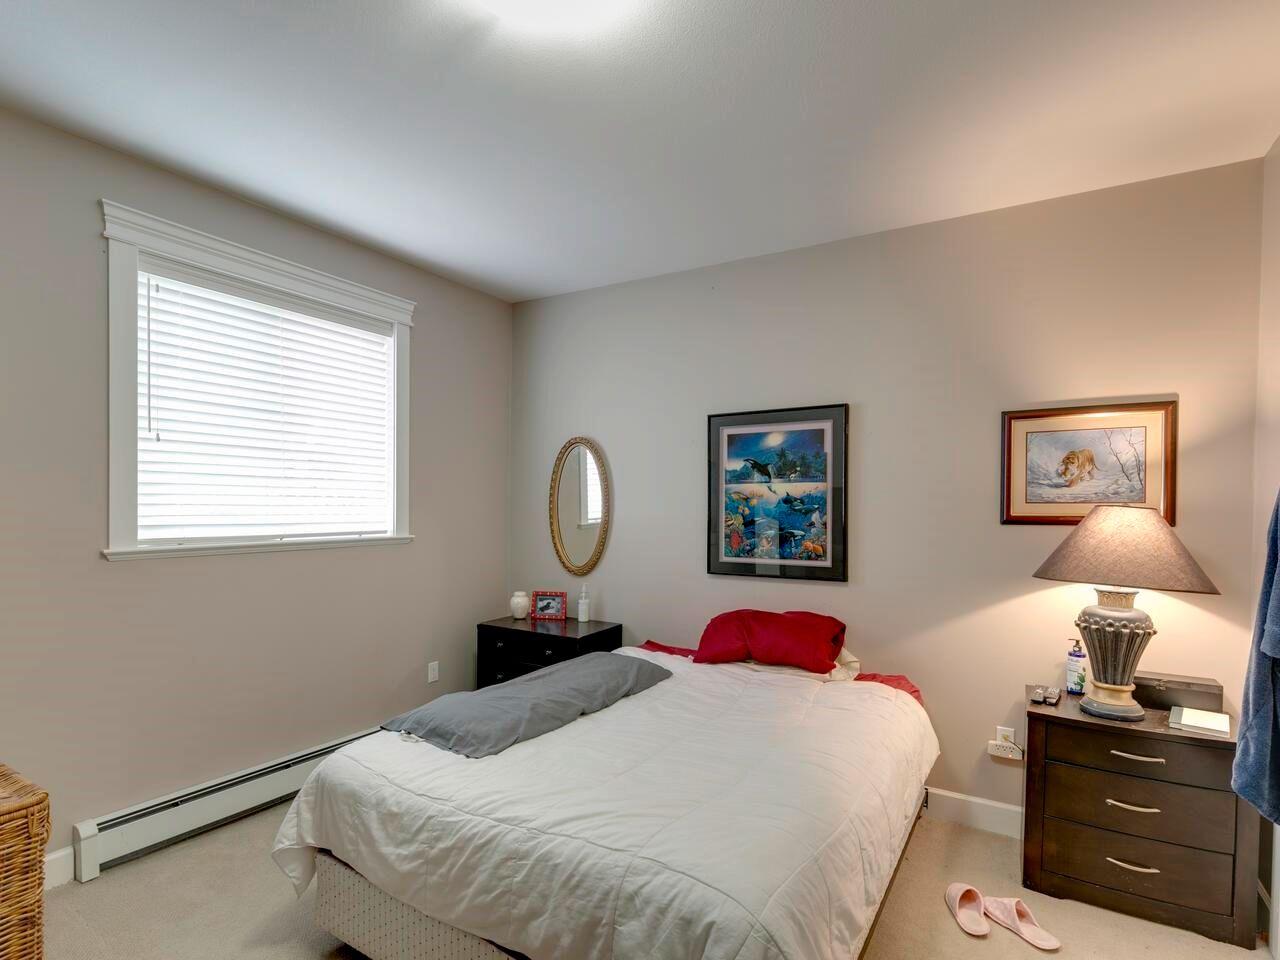 "Photo 26: Photos: 22845 126B Avenue in Maple Ridge: East Central House for sale in ""EAST CENTRAL MAPLE RIDGE"" : MLS®# R2594638"